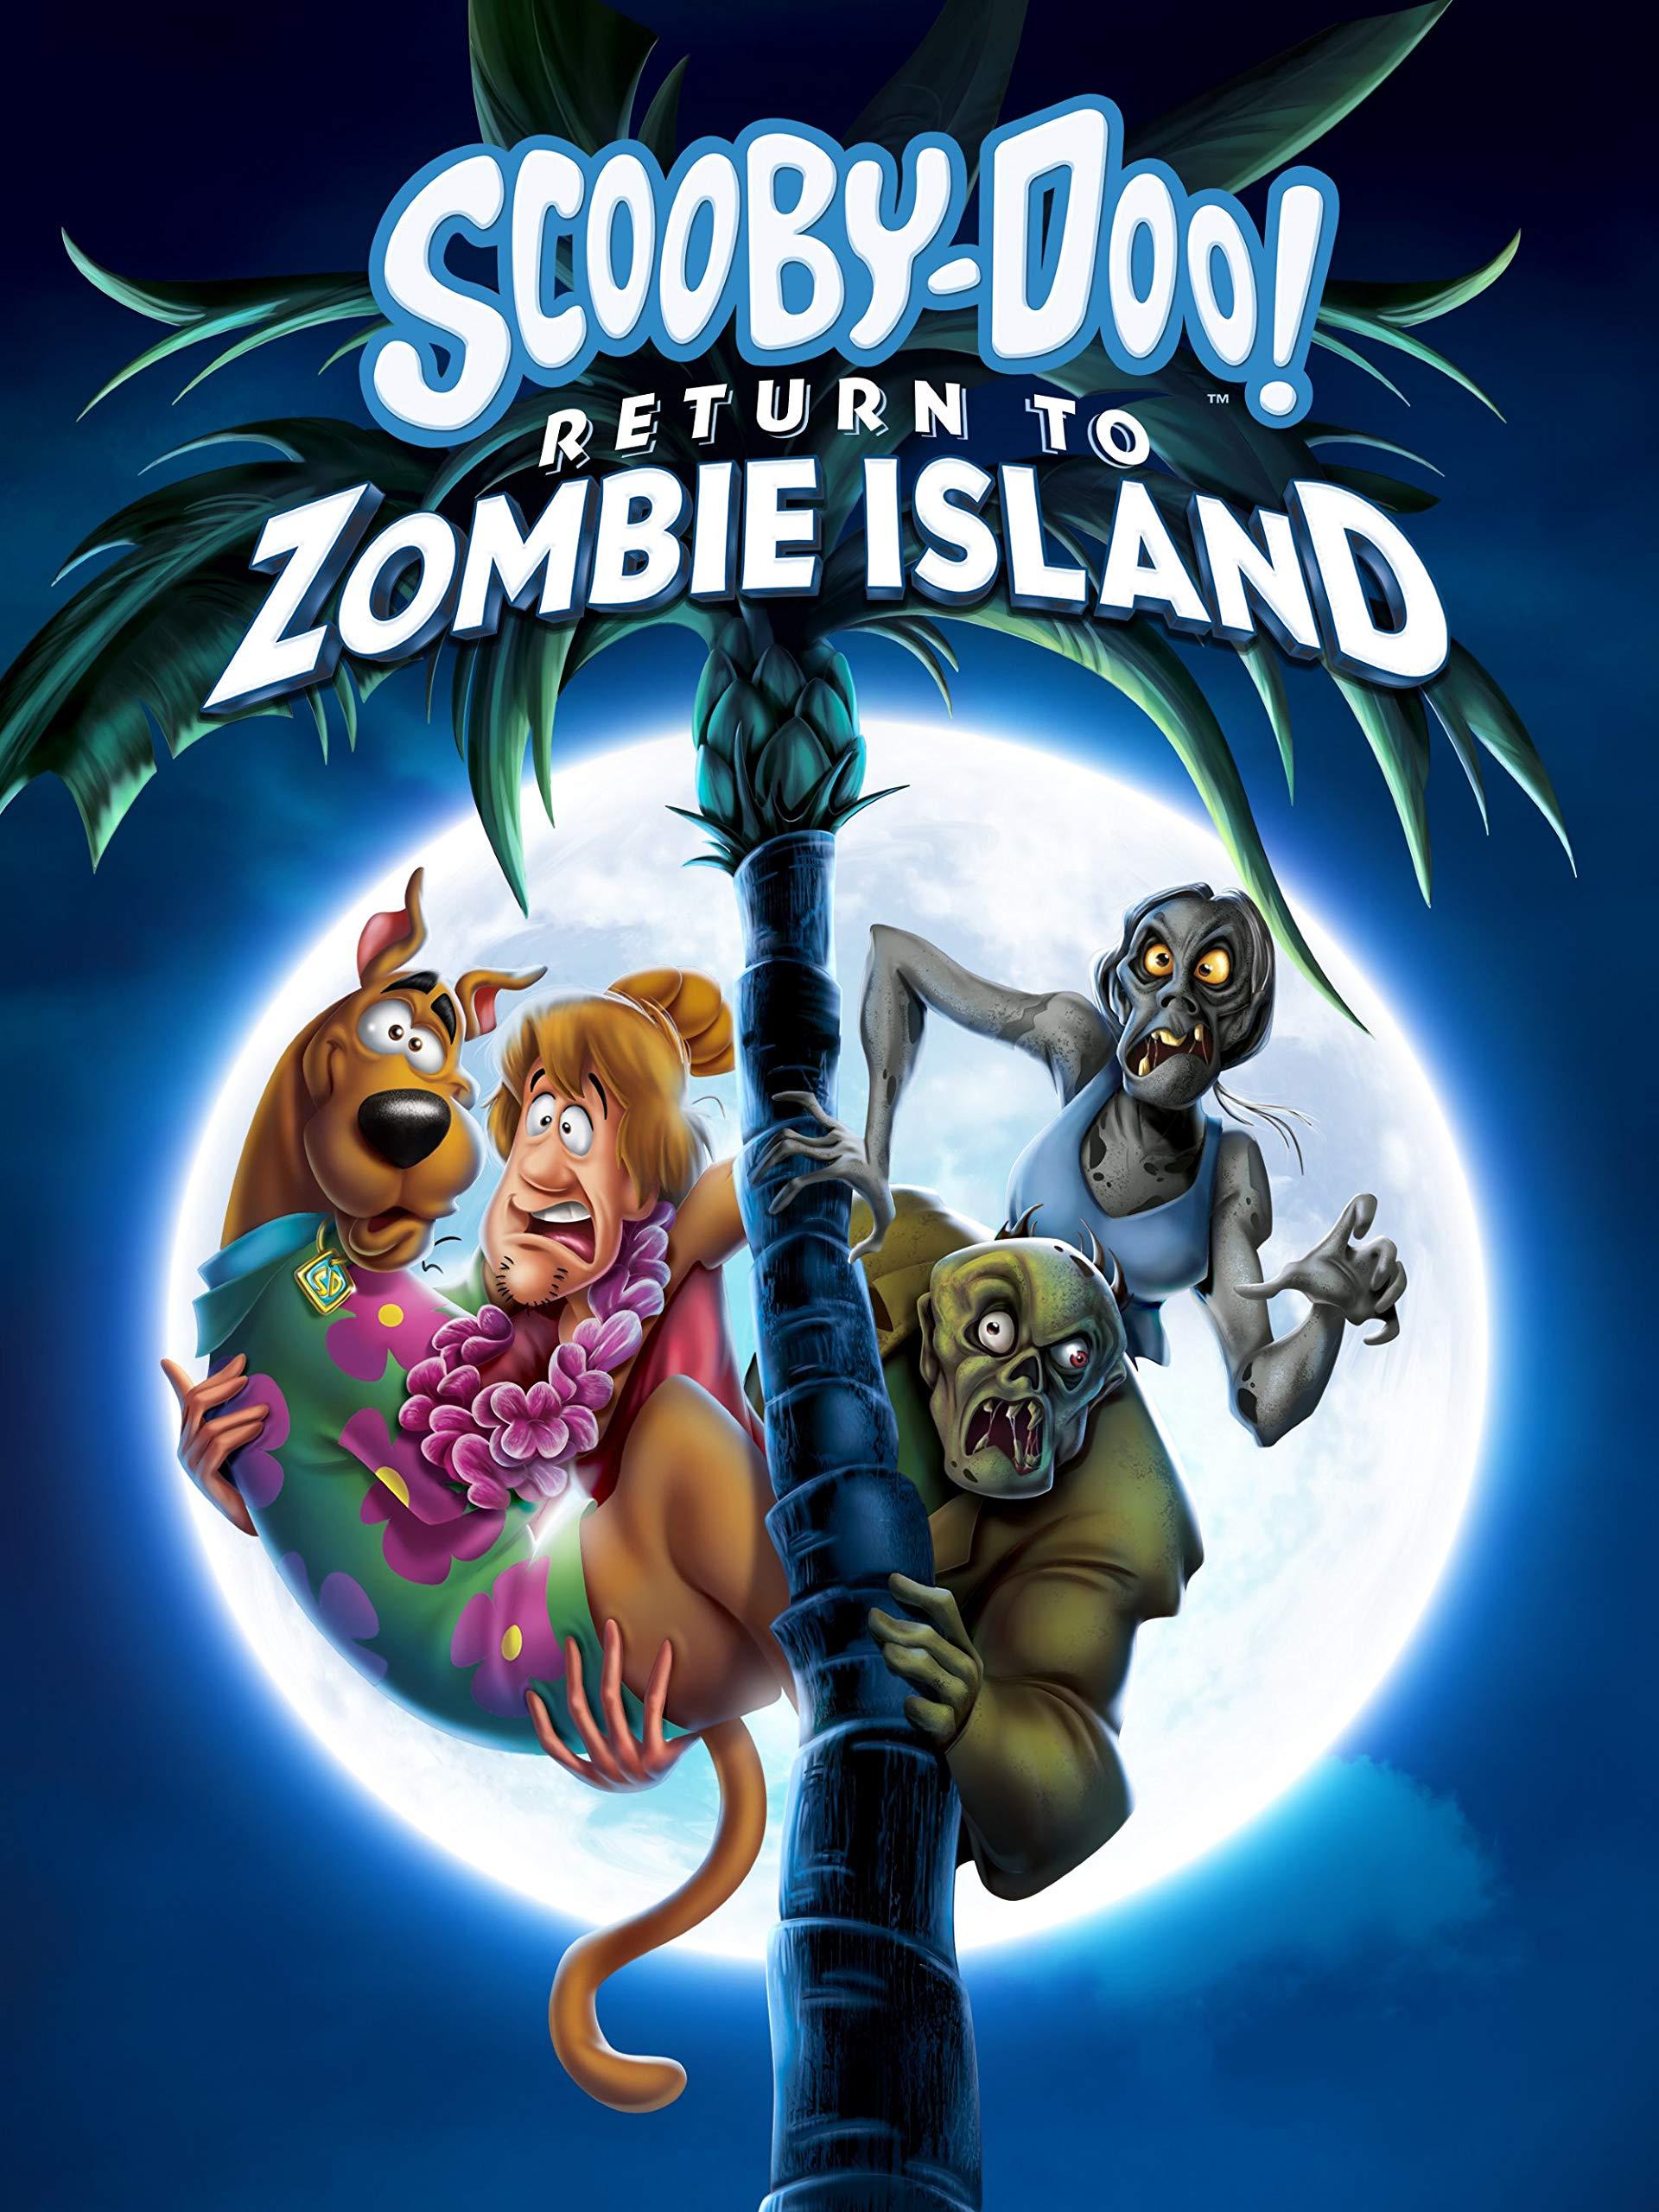 Watch Scooby Doo Return To Zombie Island Prime Video